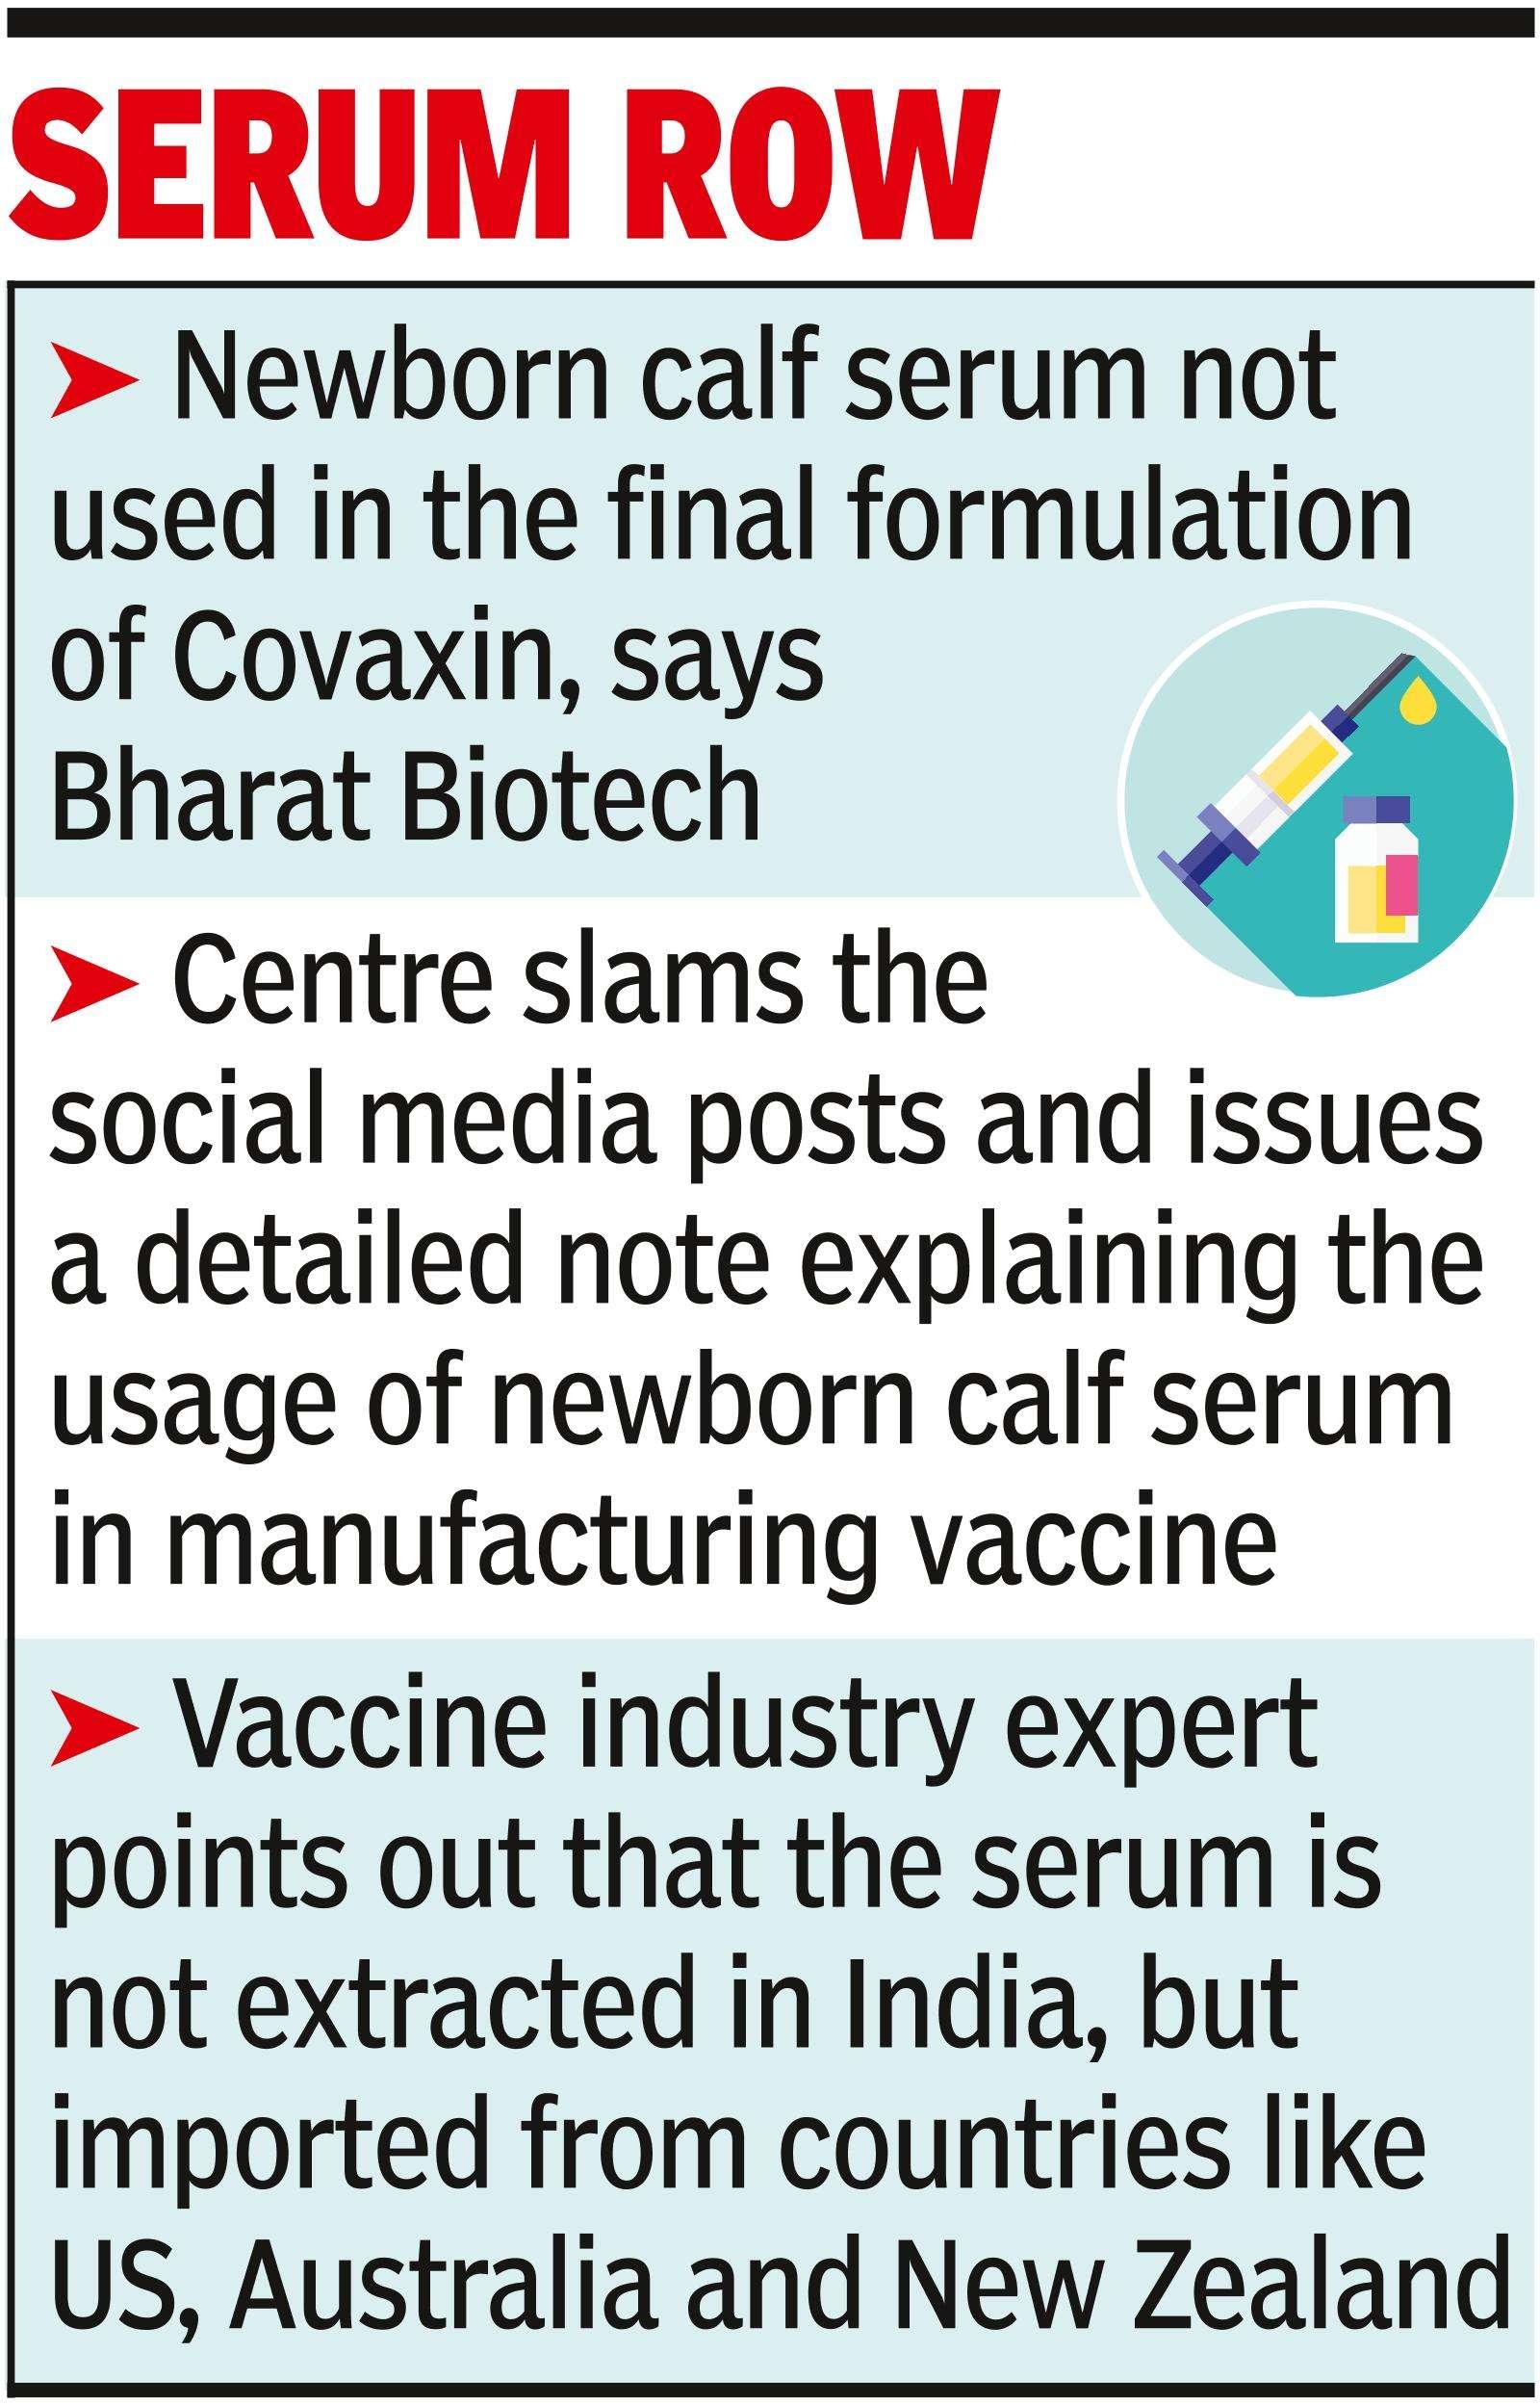 No newborn calf serum used in Covaxin, say Centre & BB